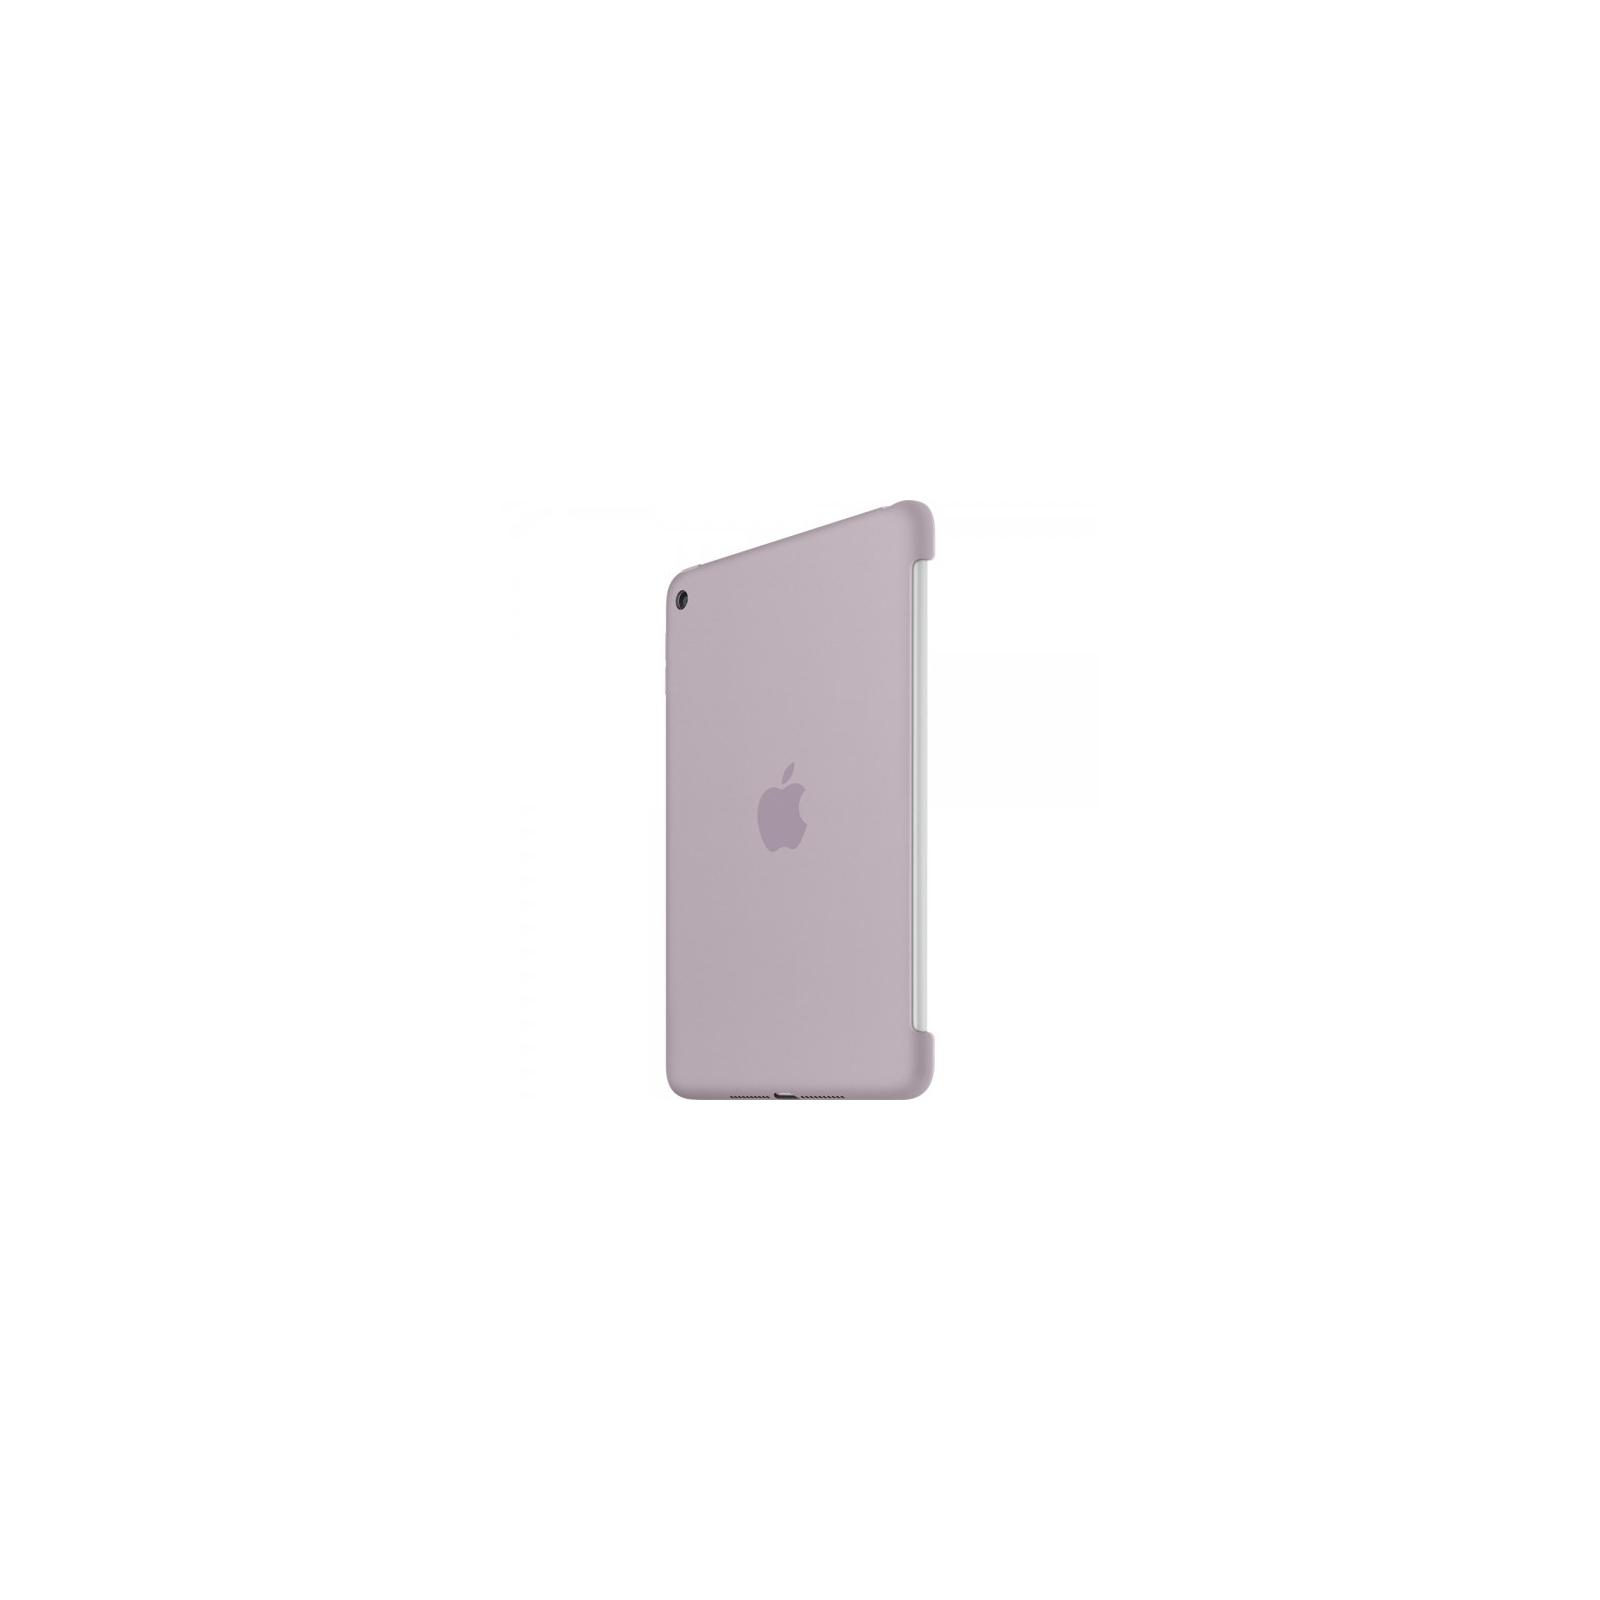 Чехол для планшета Apple iPad mini 4 Lavender (MLD62ZM/A) изображение 2